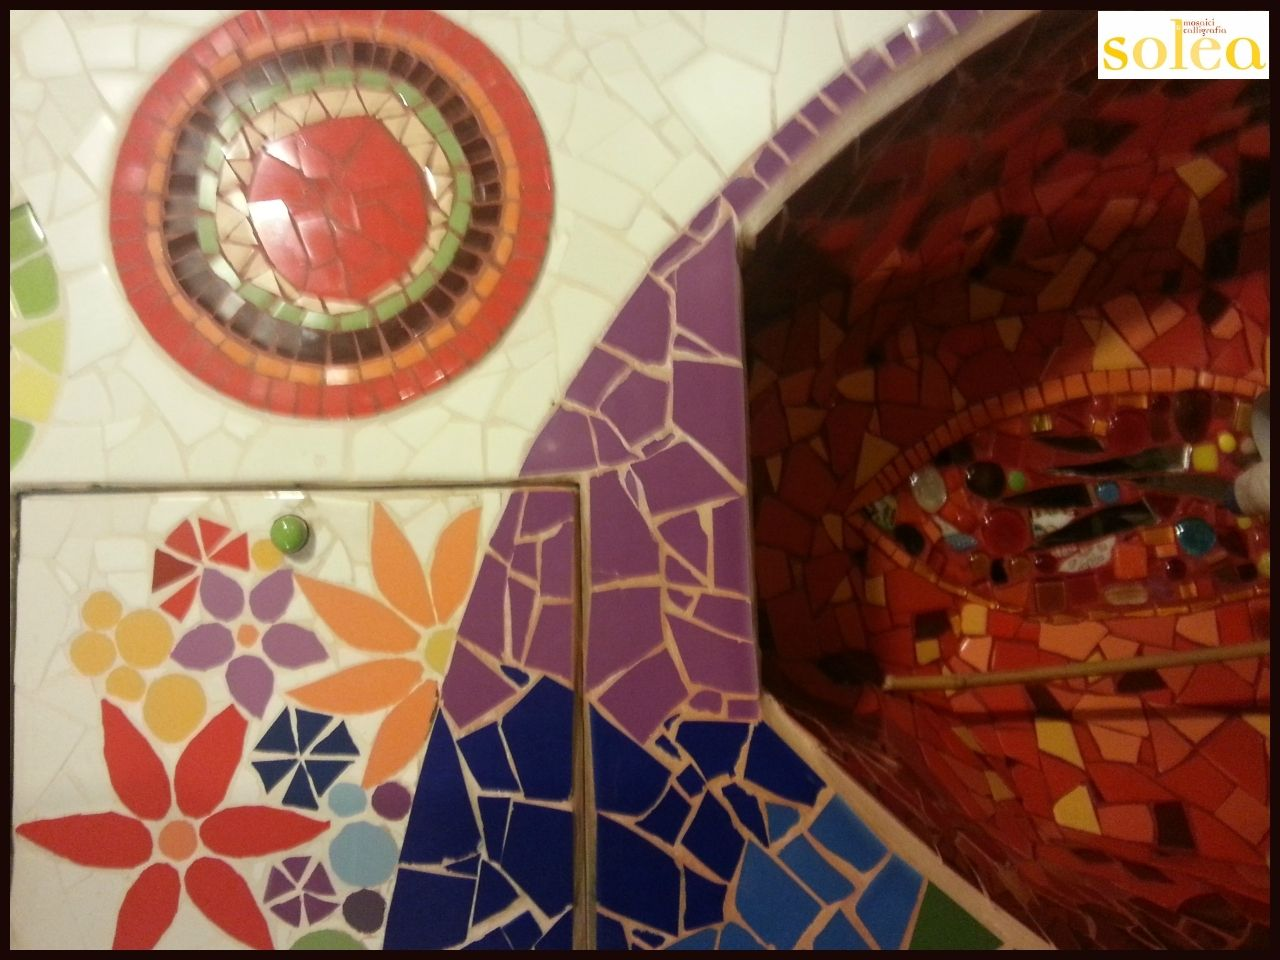 Mosaico a parete wall mosaic for the home mosaic for Parete a mosaico